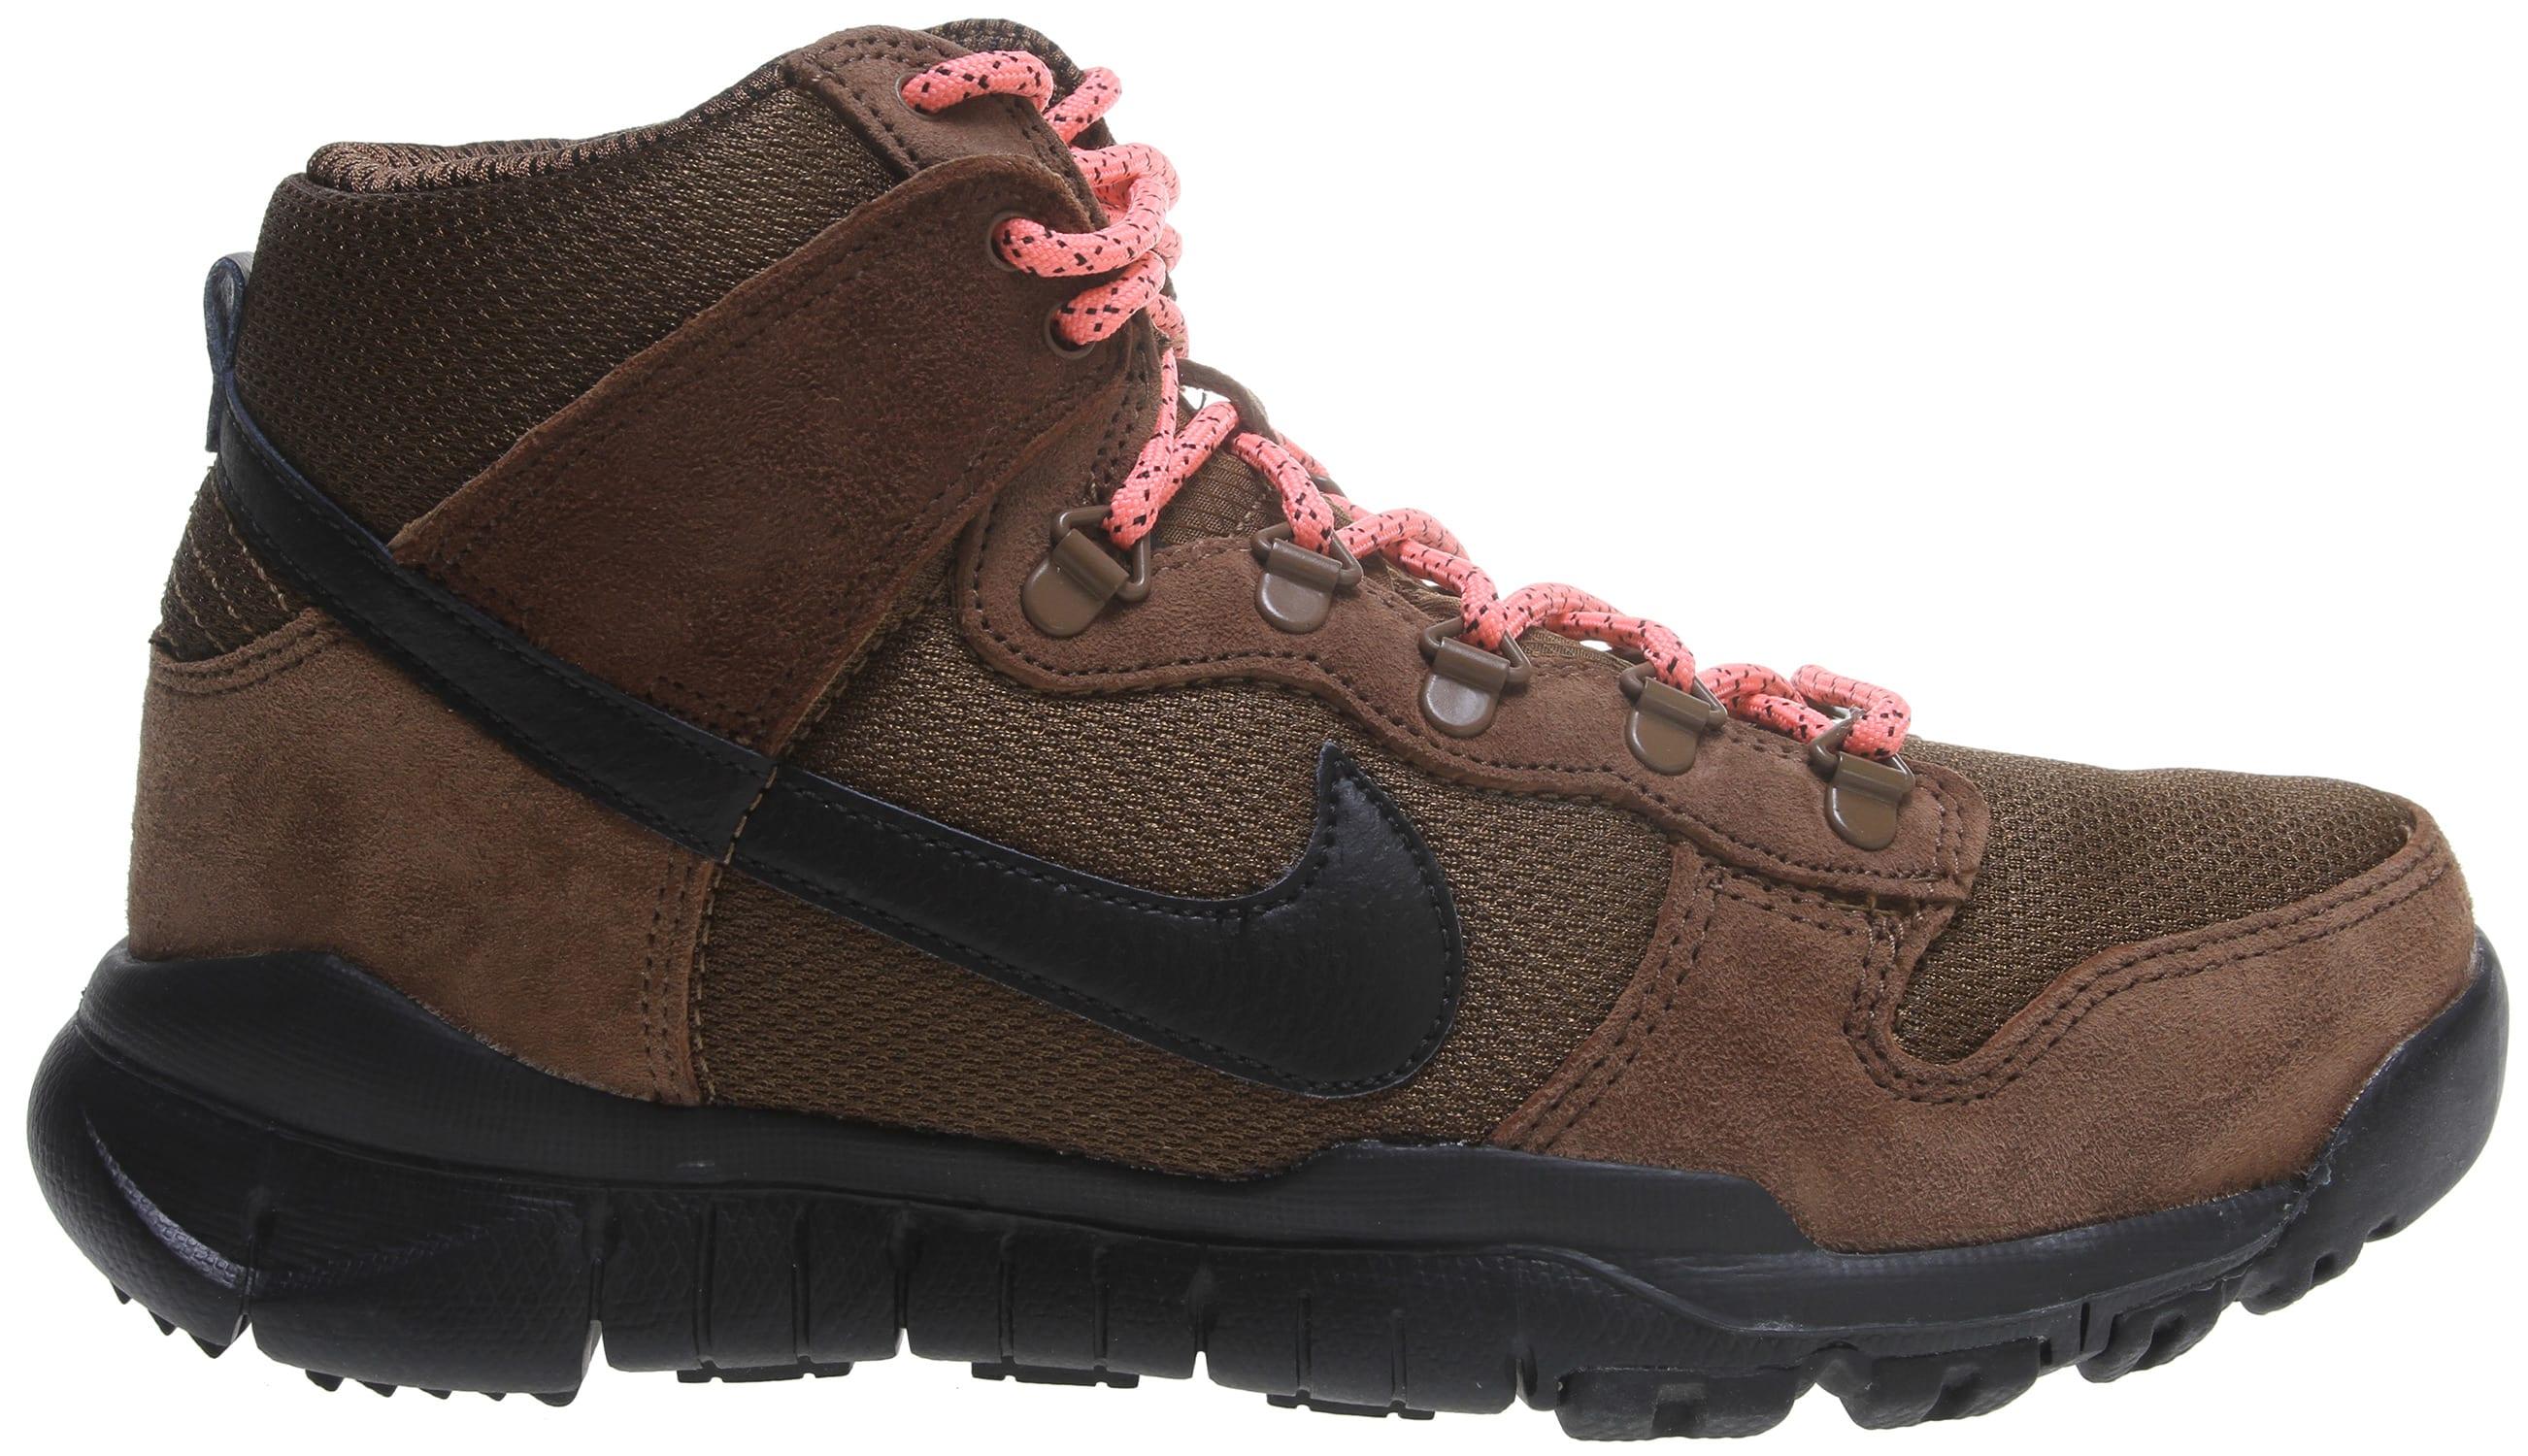 Nike Dunk High Boot Extreme Hostingcouk